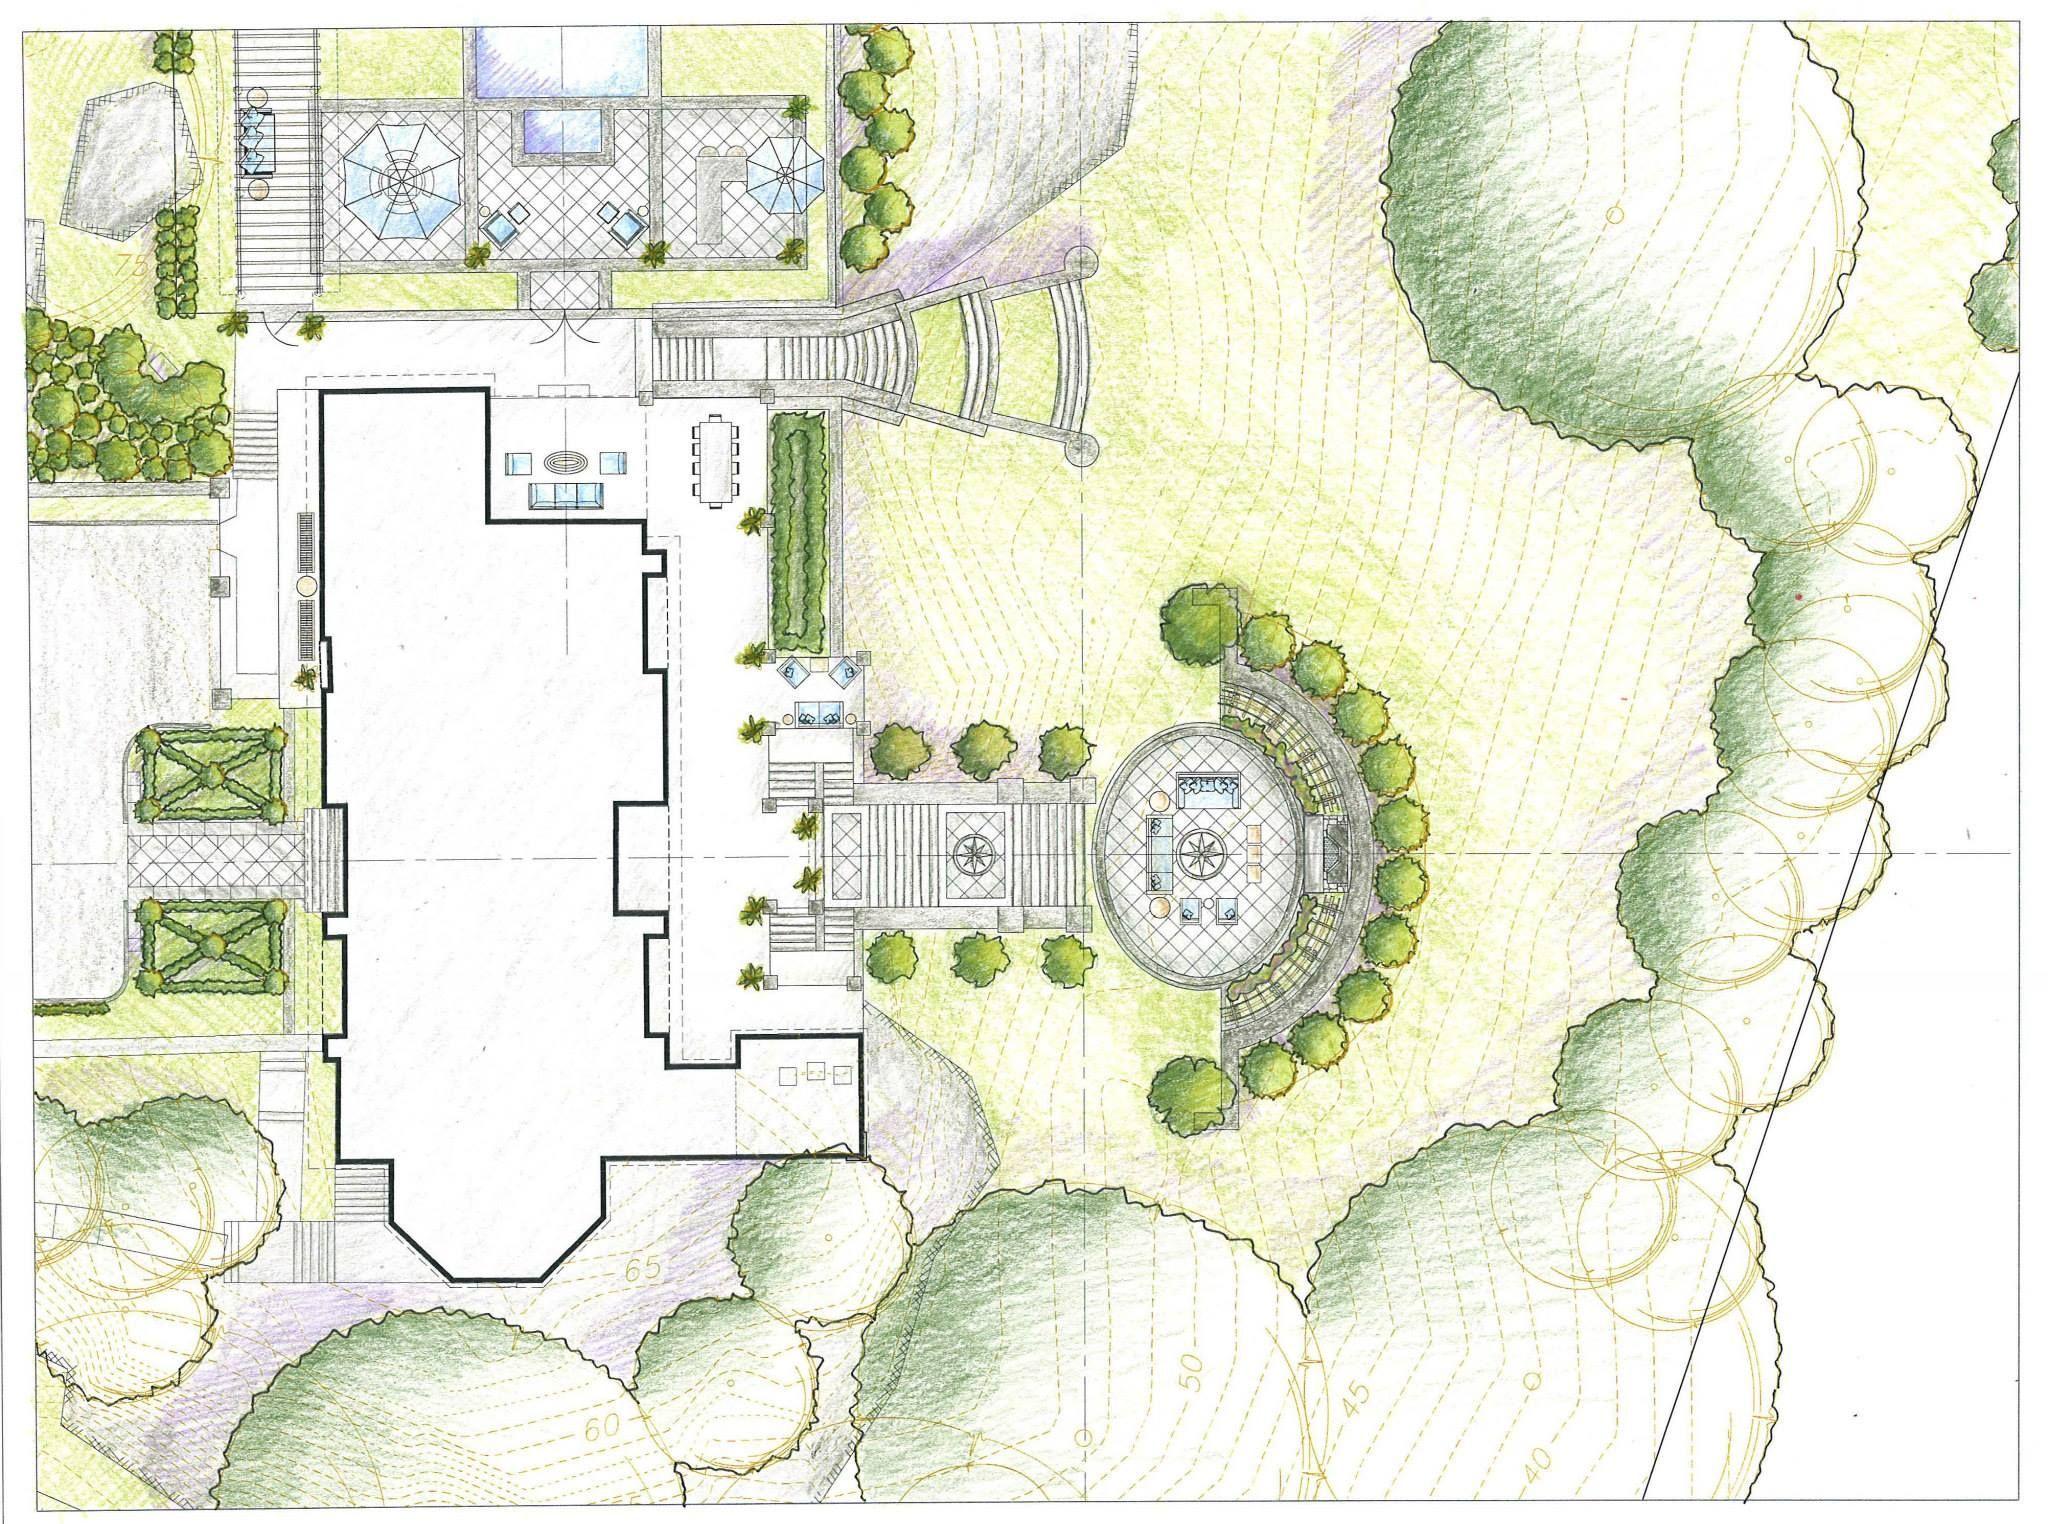 Shellytallacklandscapedesign Sectionelevation 2 Jpg 1020 650 Landscape Architecture Section Architecture Concept Drawings Landscape Design Plans